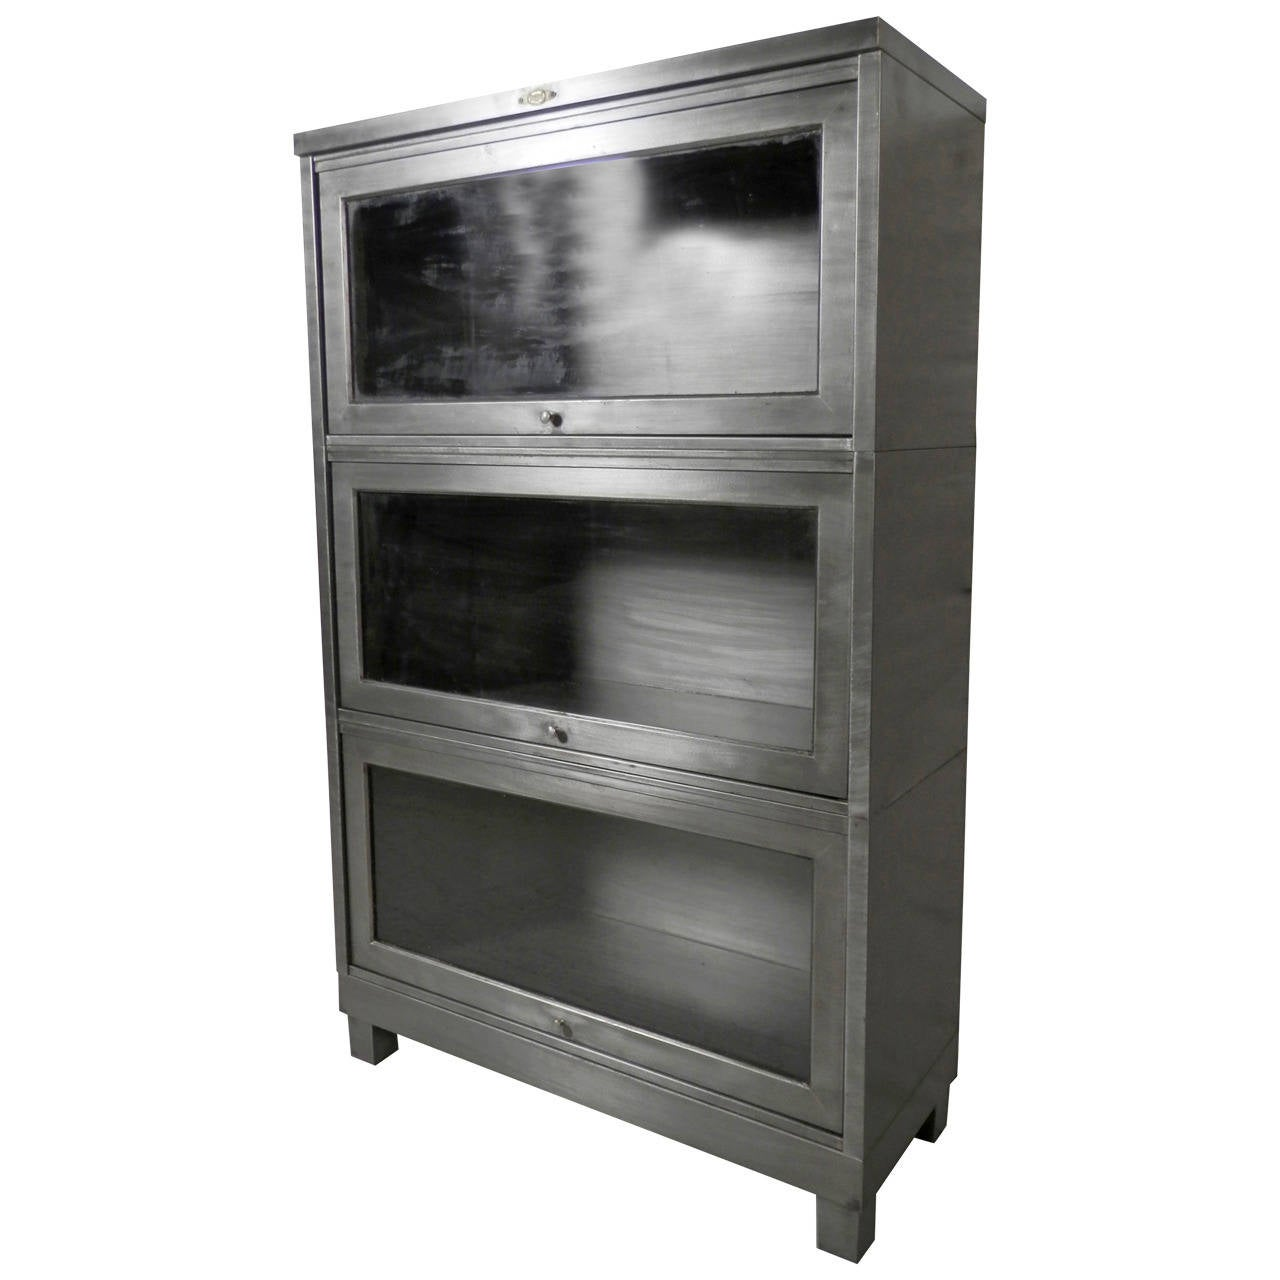 Restored Barrister Metal Bookcase 1 - Restored Barrister Metal Bookcase At 1stdibs